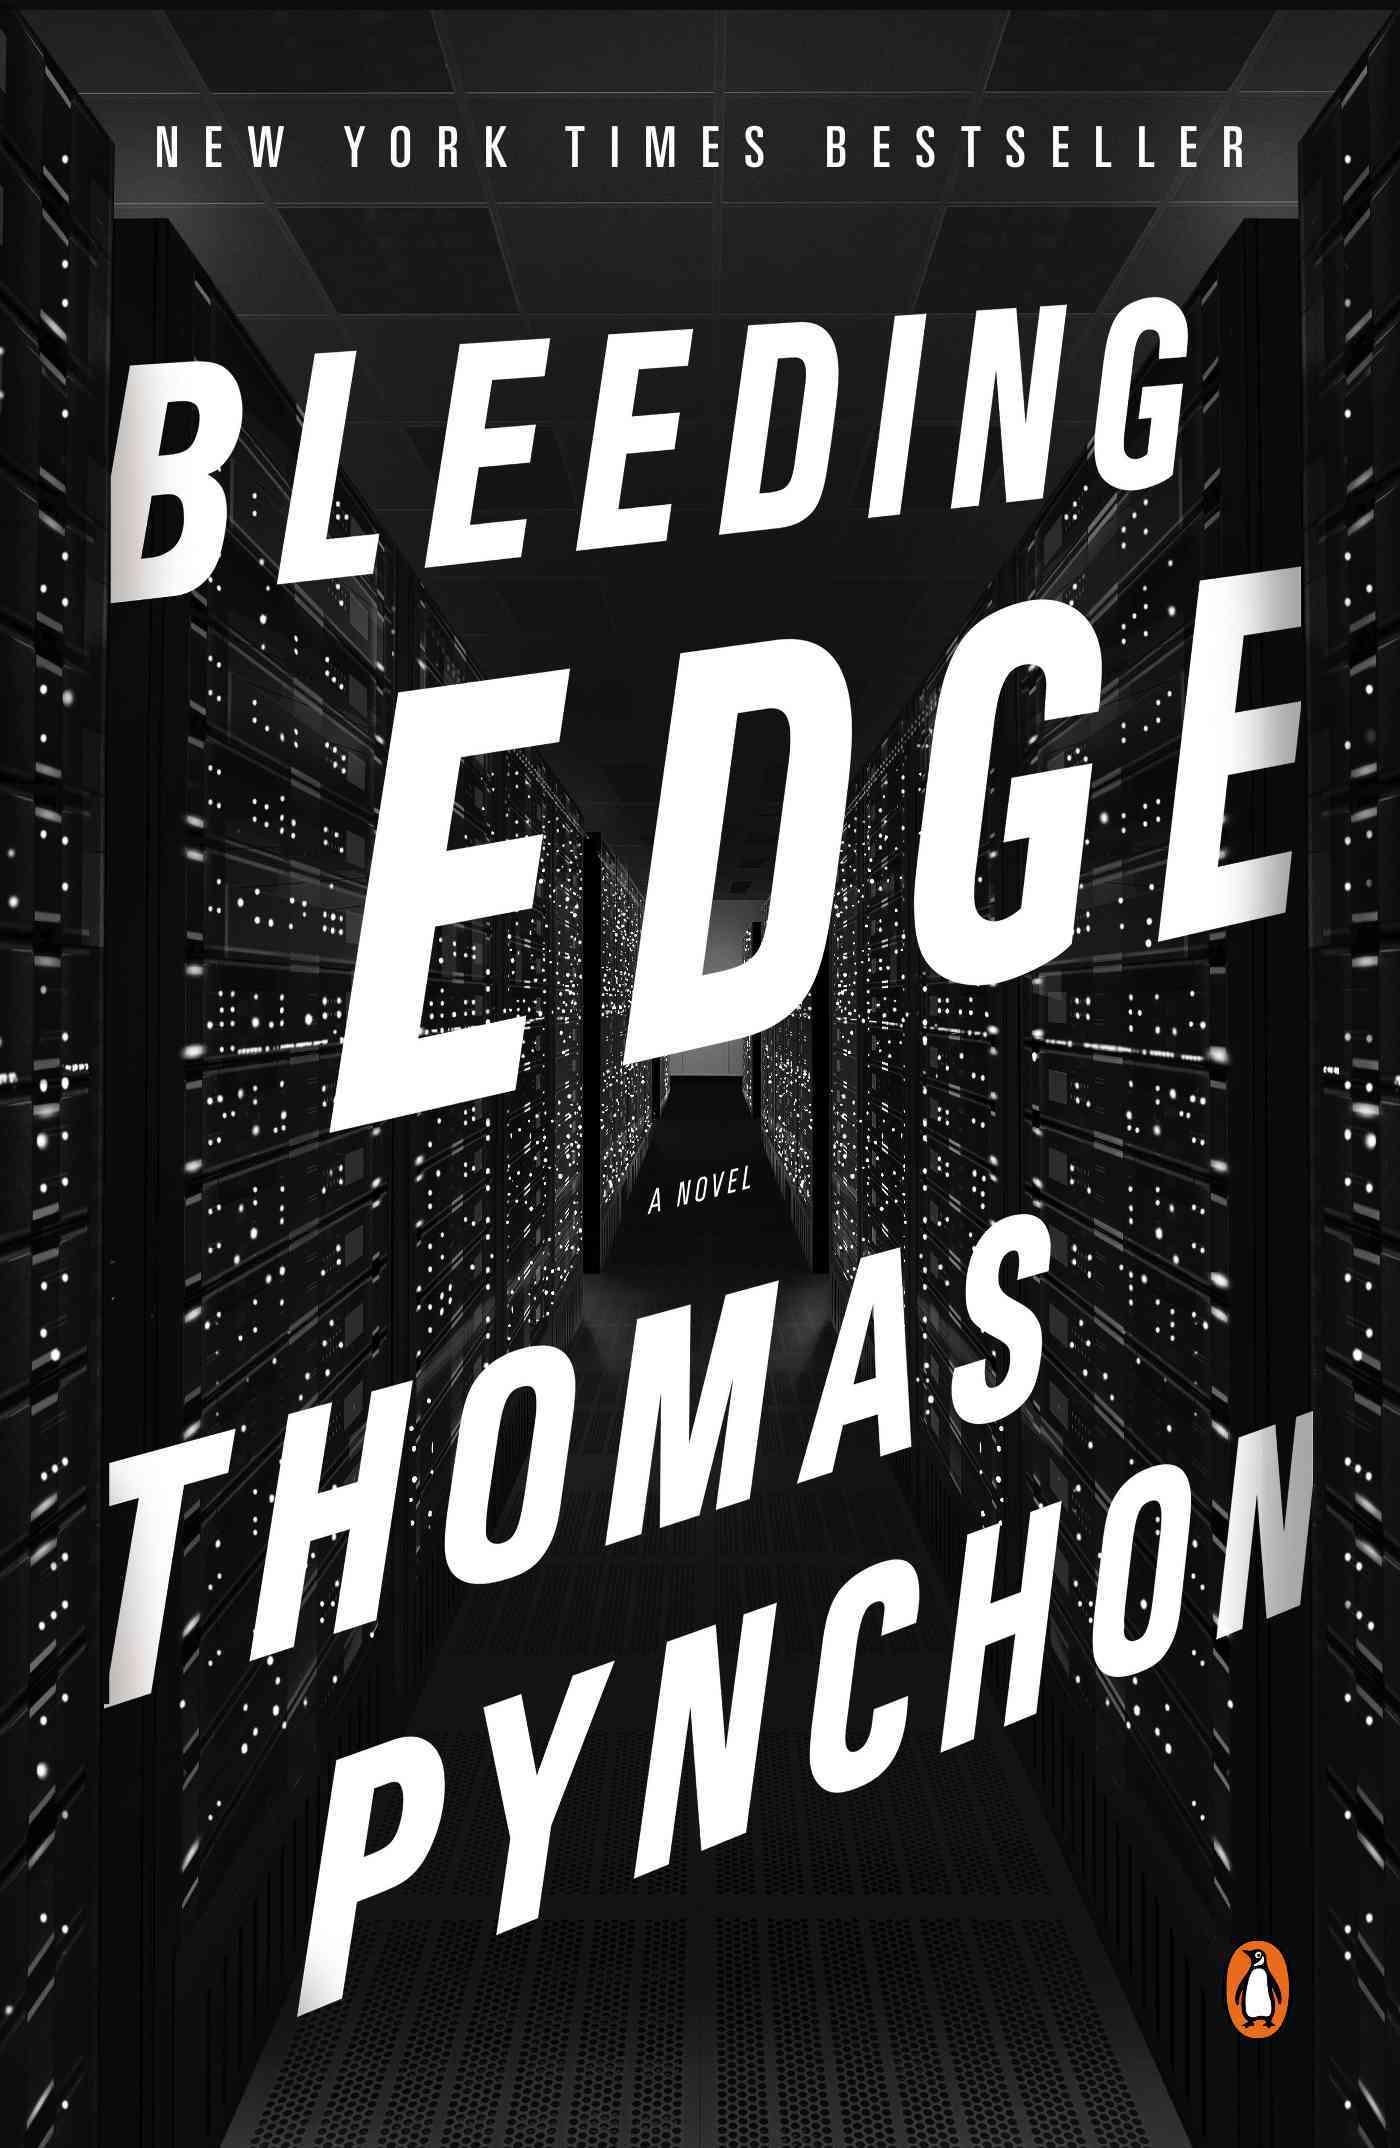 Bleeding Edge By Pynchon, Thomas